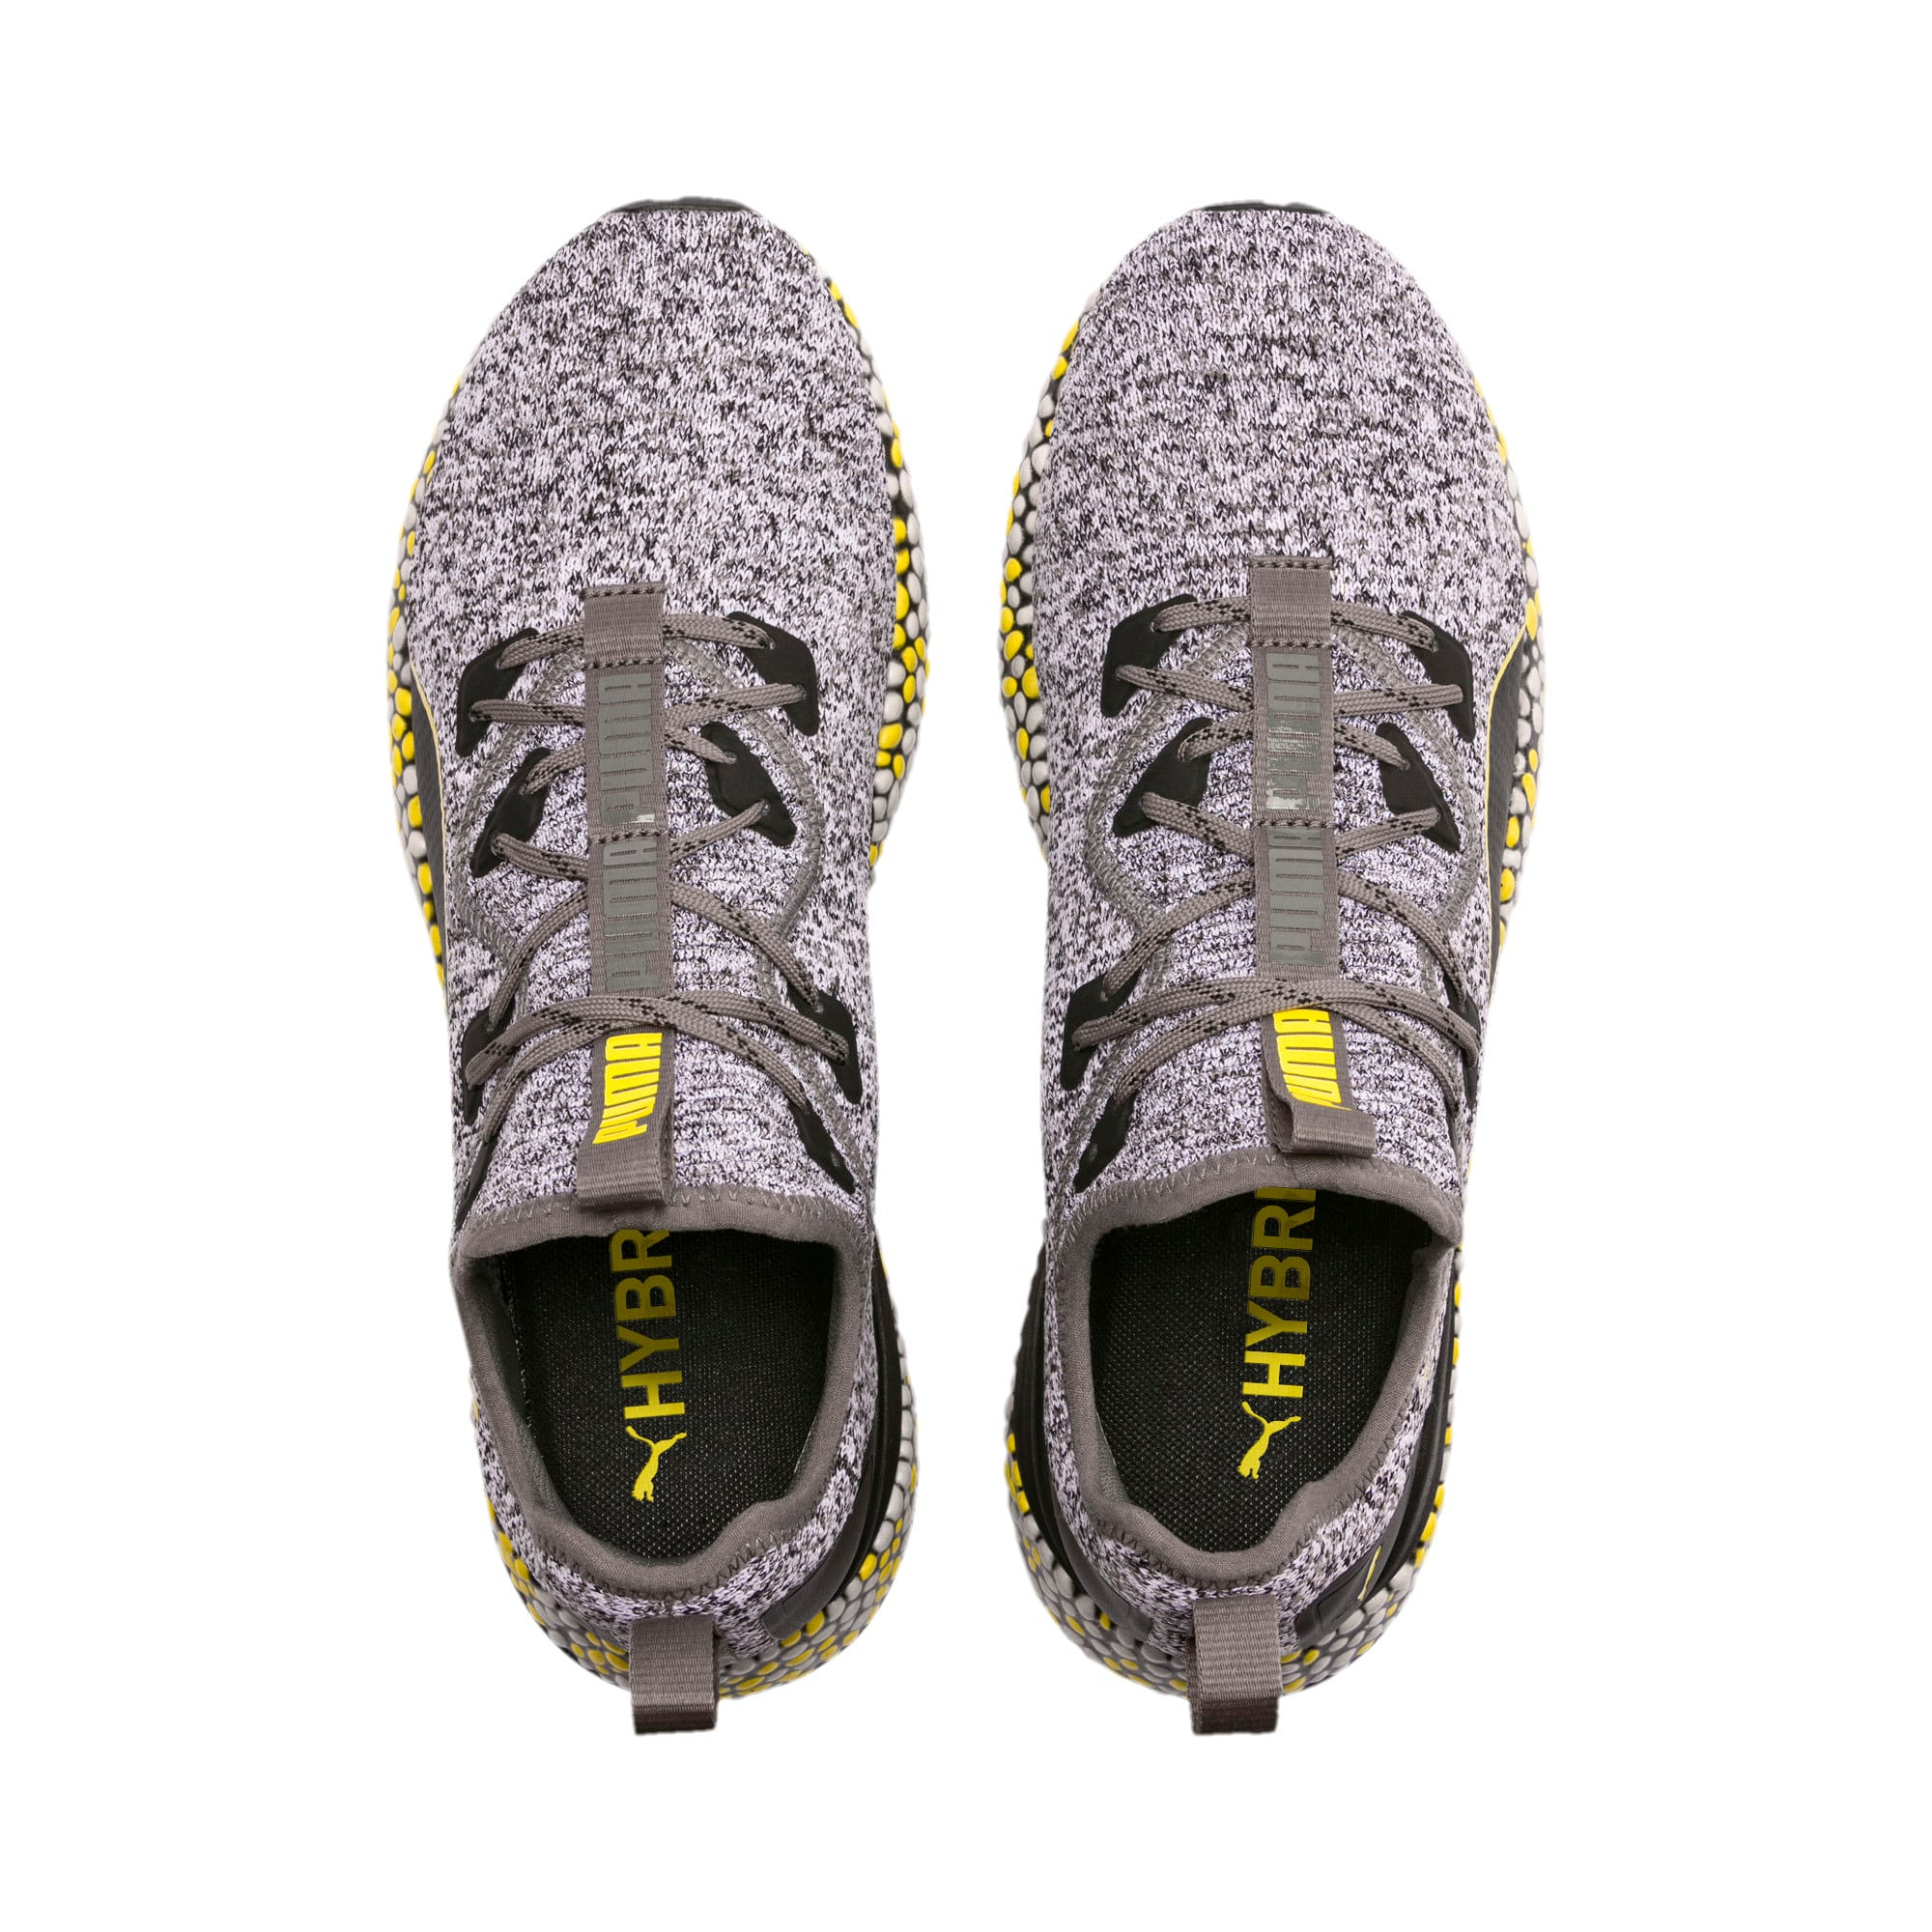 Thumbnail 6 of Hybrid Runner hardloopschoenen voor heren, Black-White-Blazing Yellow, medium